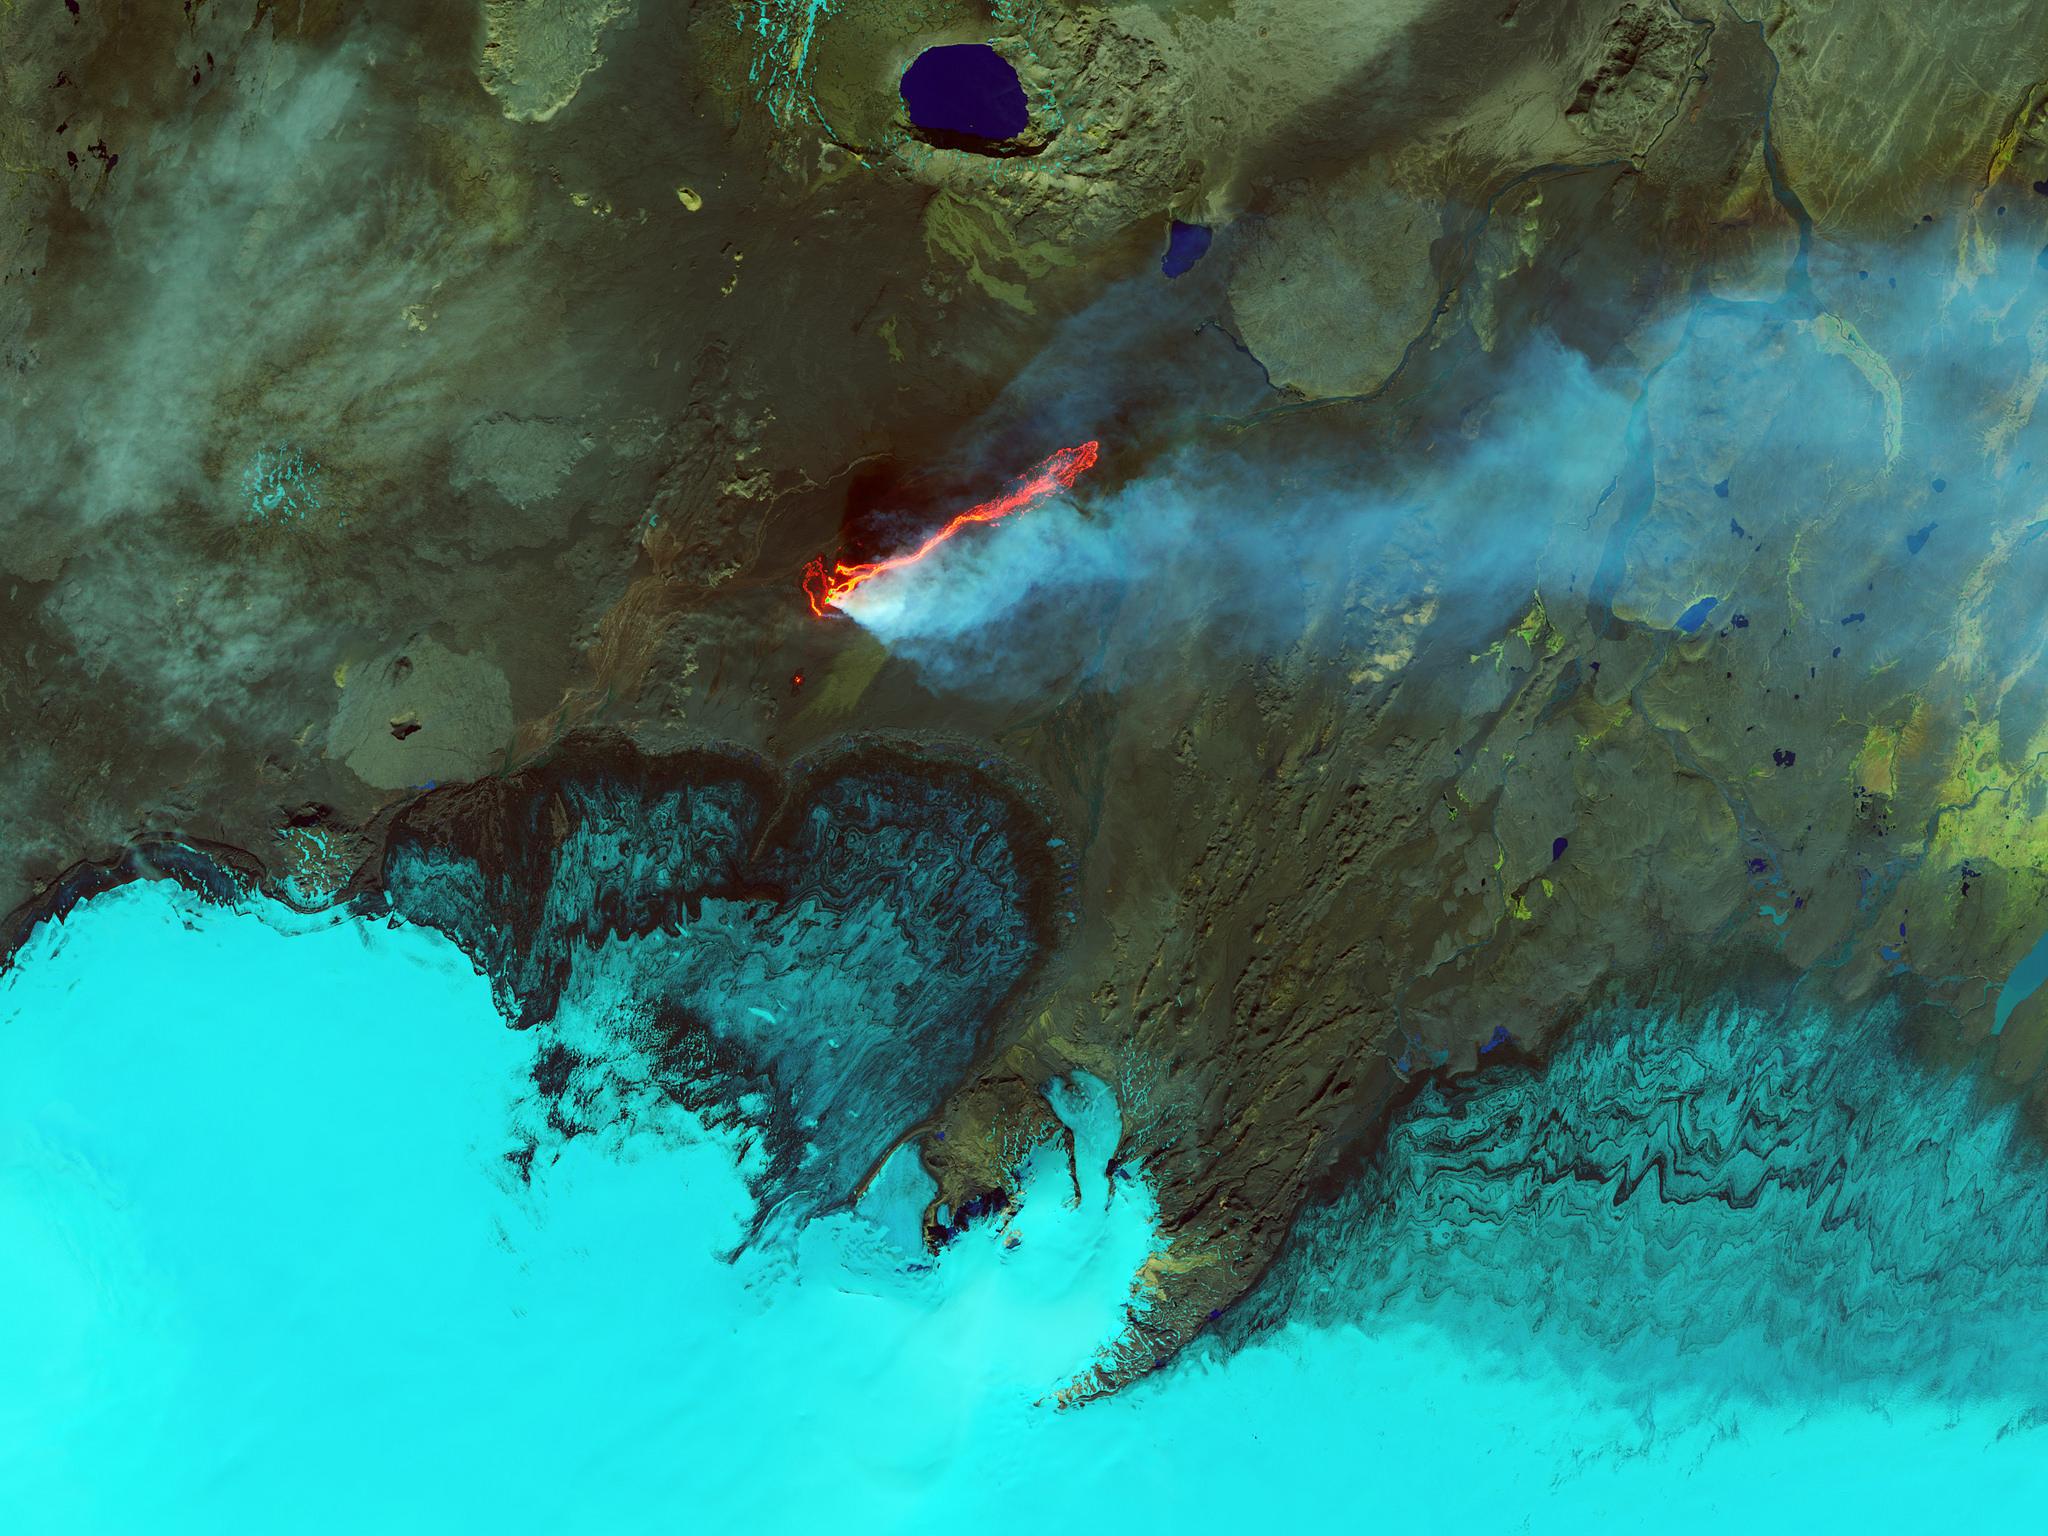 General 2048x1536 nature landscape water aerial view sea coast lake volcano eruption smoke lava NASA Iceland mountains